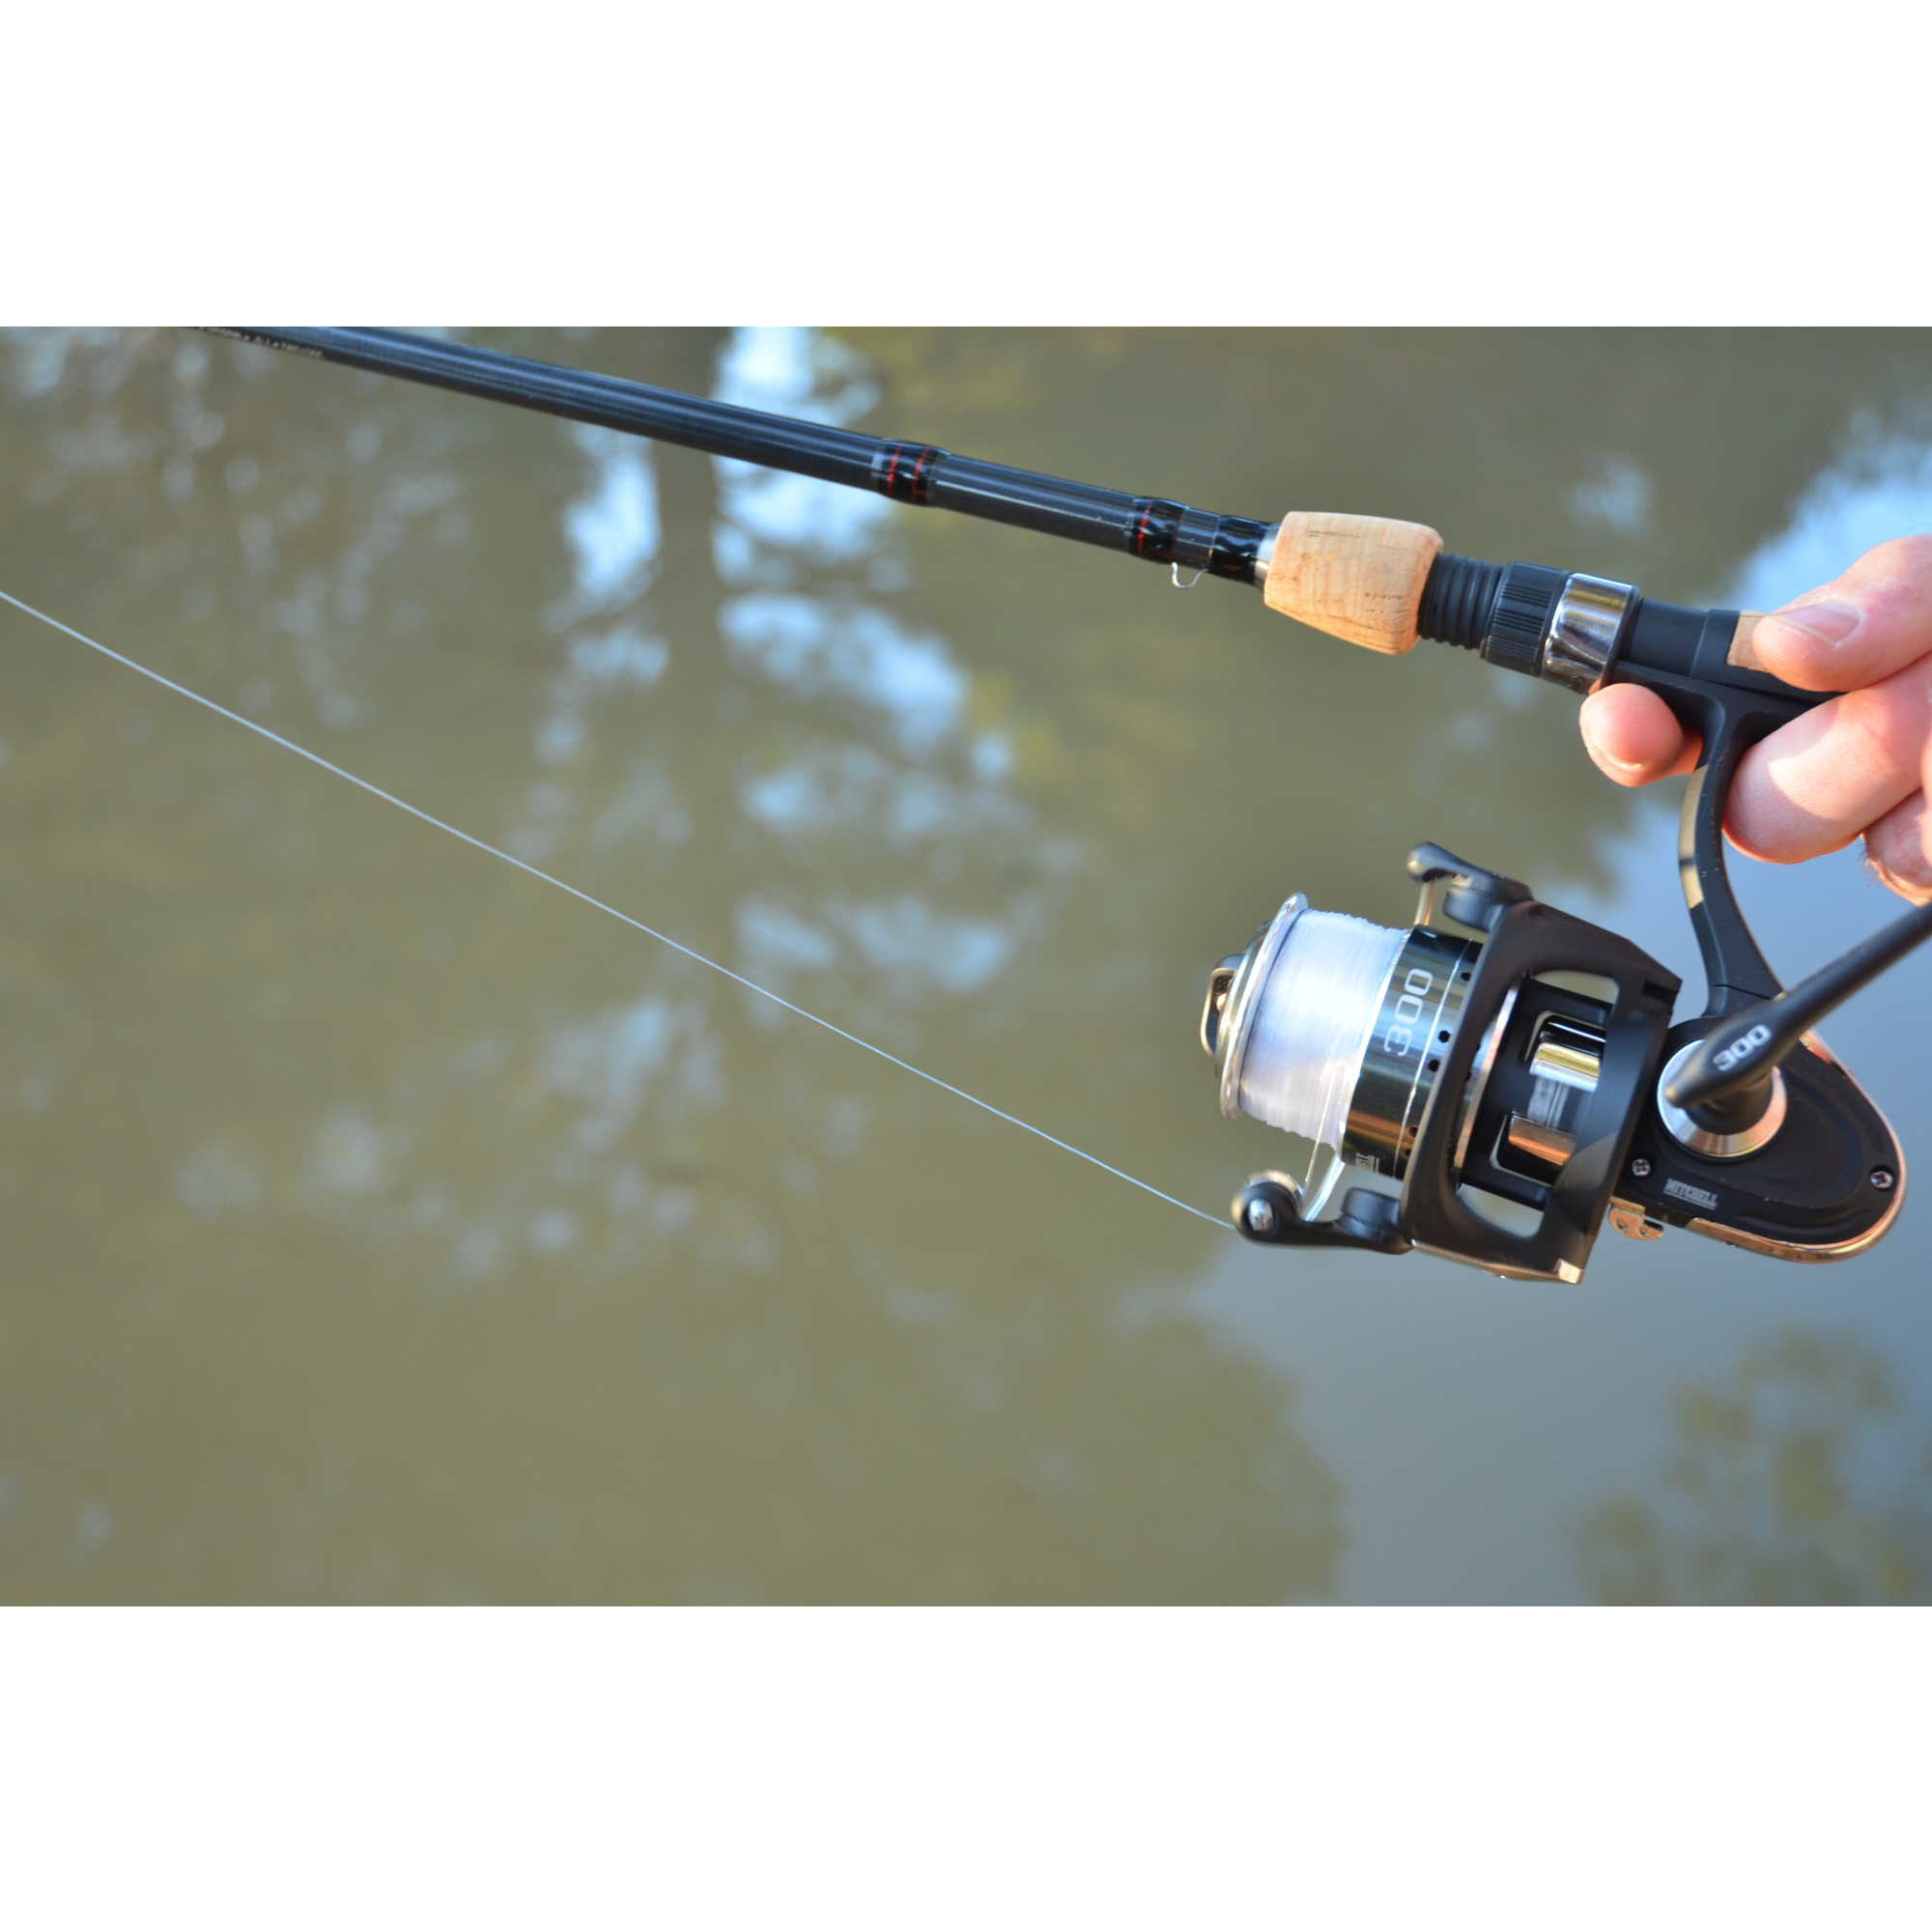 mitchell 300 spinning fishing reel - walmart